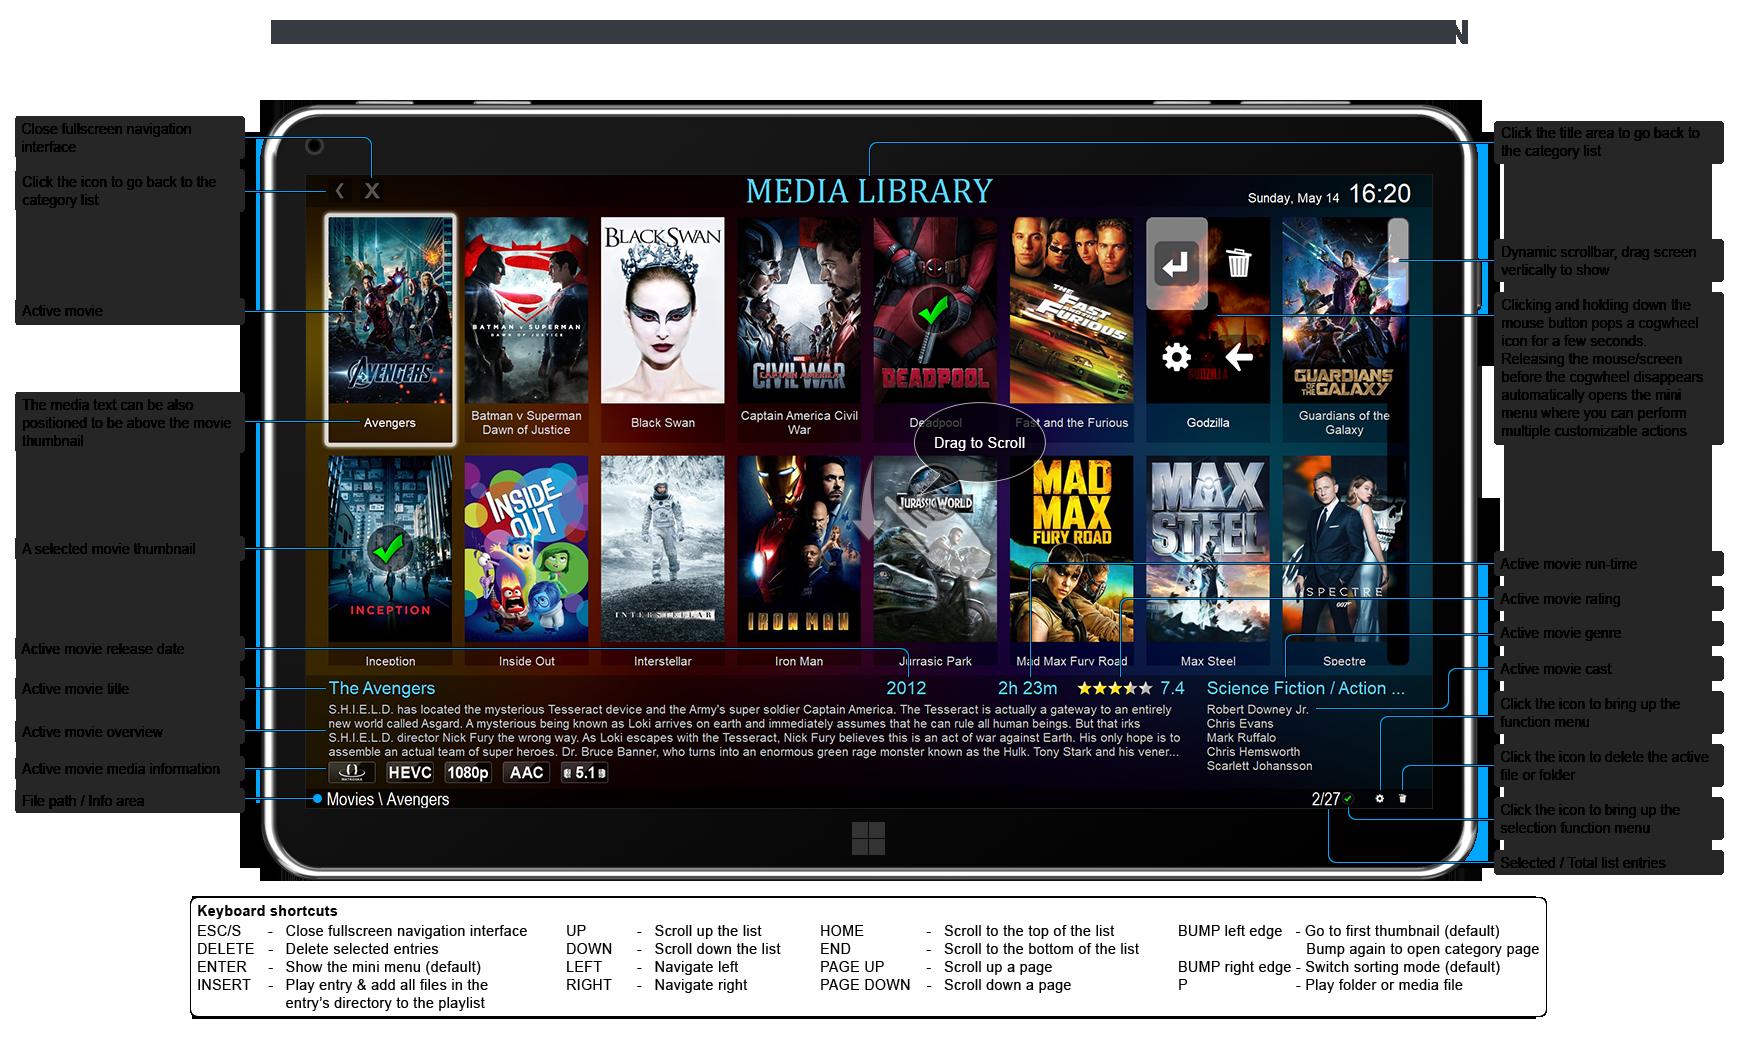 Fullscreen Navigation (media library movie mode)